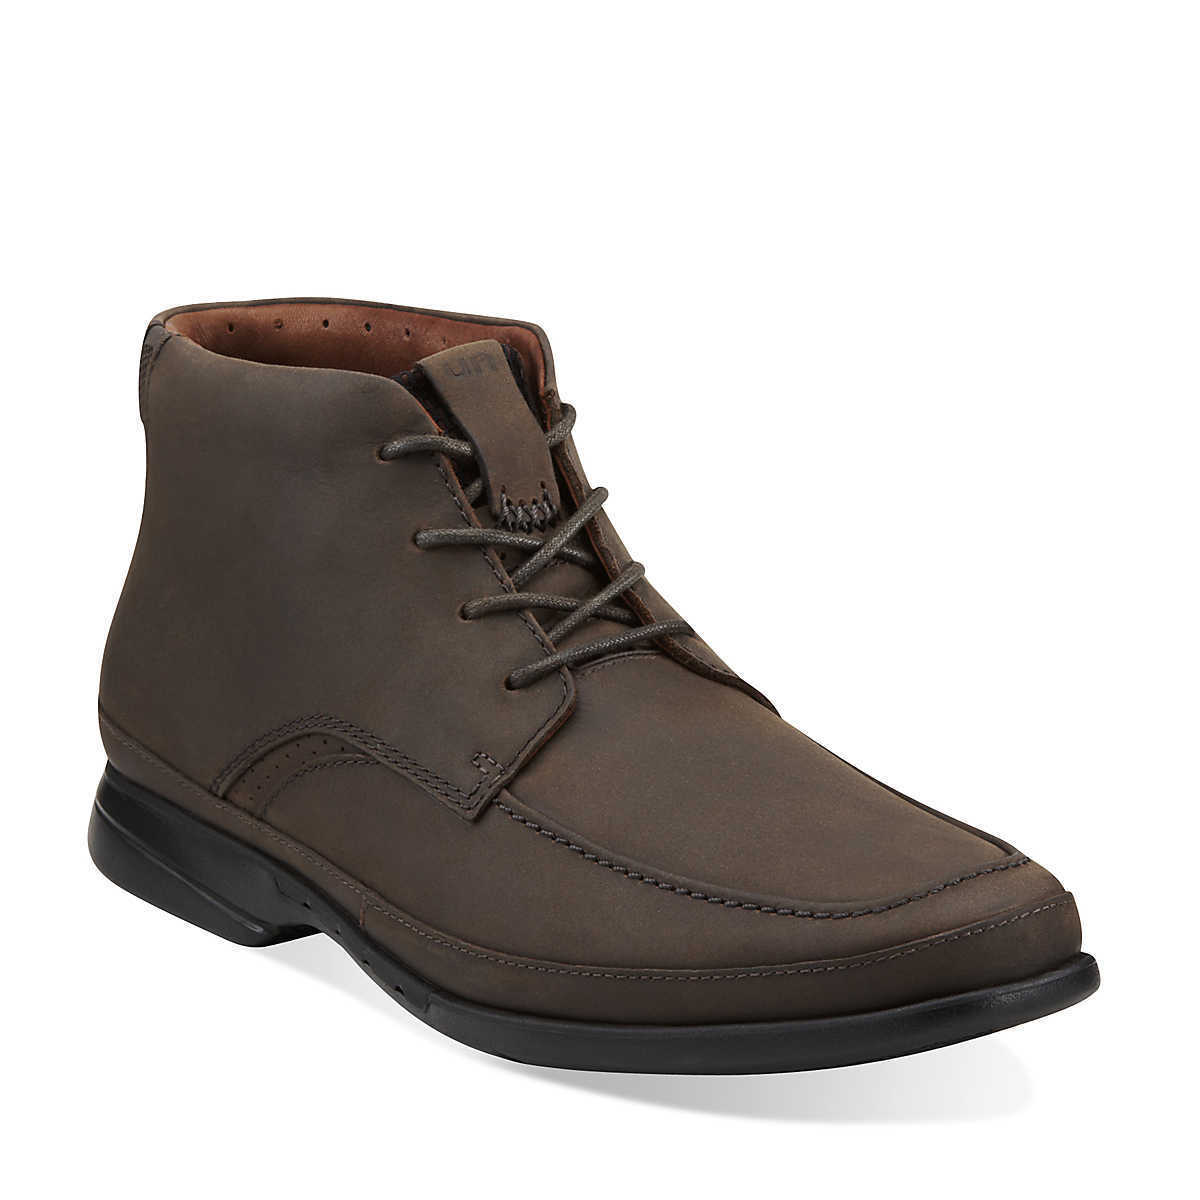 Men's Clarks Unstructured Un.Montag Ankle Lace Up Boot Brown Nubuck 62200 Wide